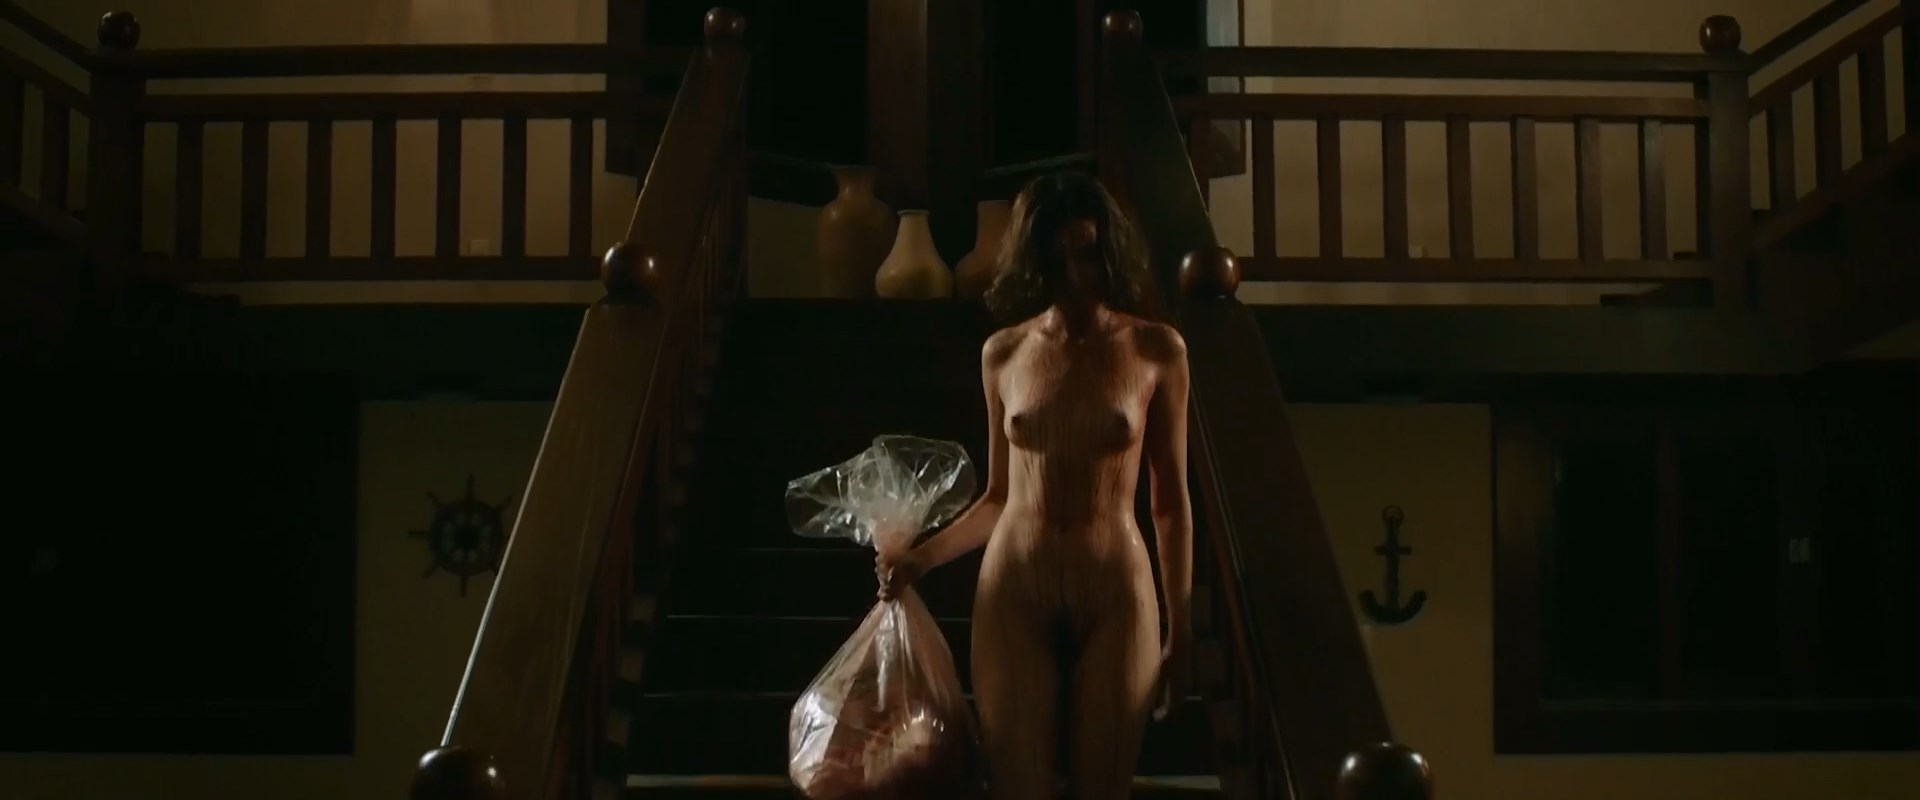 Ana Luiza Rios nude - The Cannibal Club (2018)